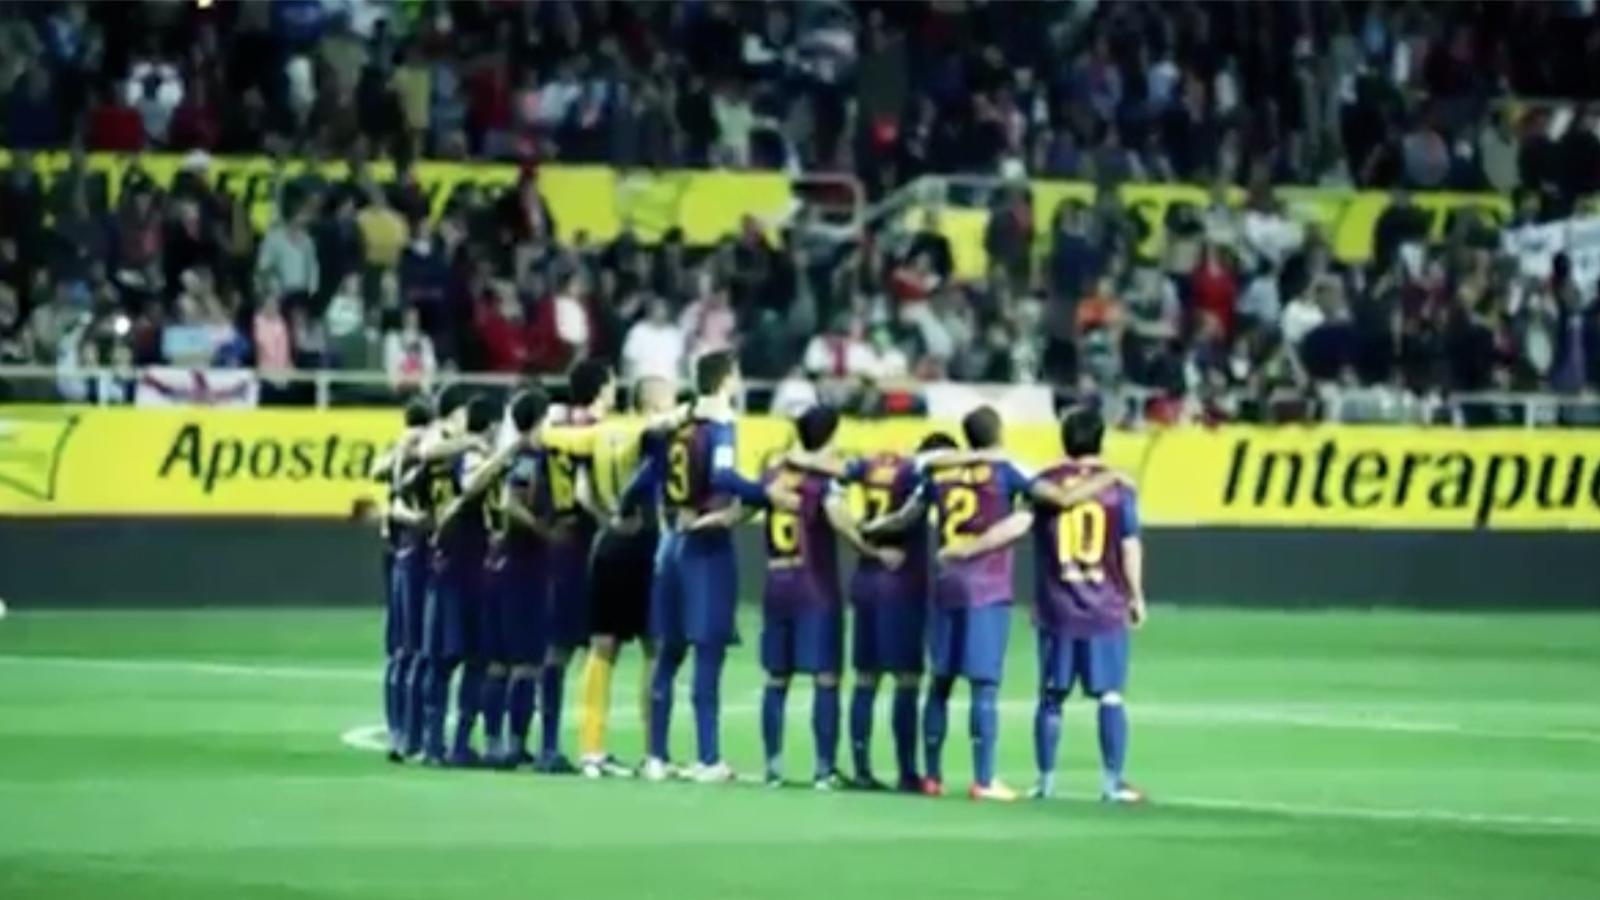 Vídeo promocional de la final de Copa que ha fet la productora de Pinto, Wahin Makinaciones